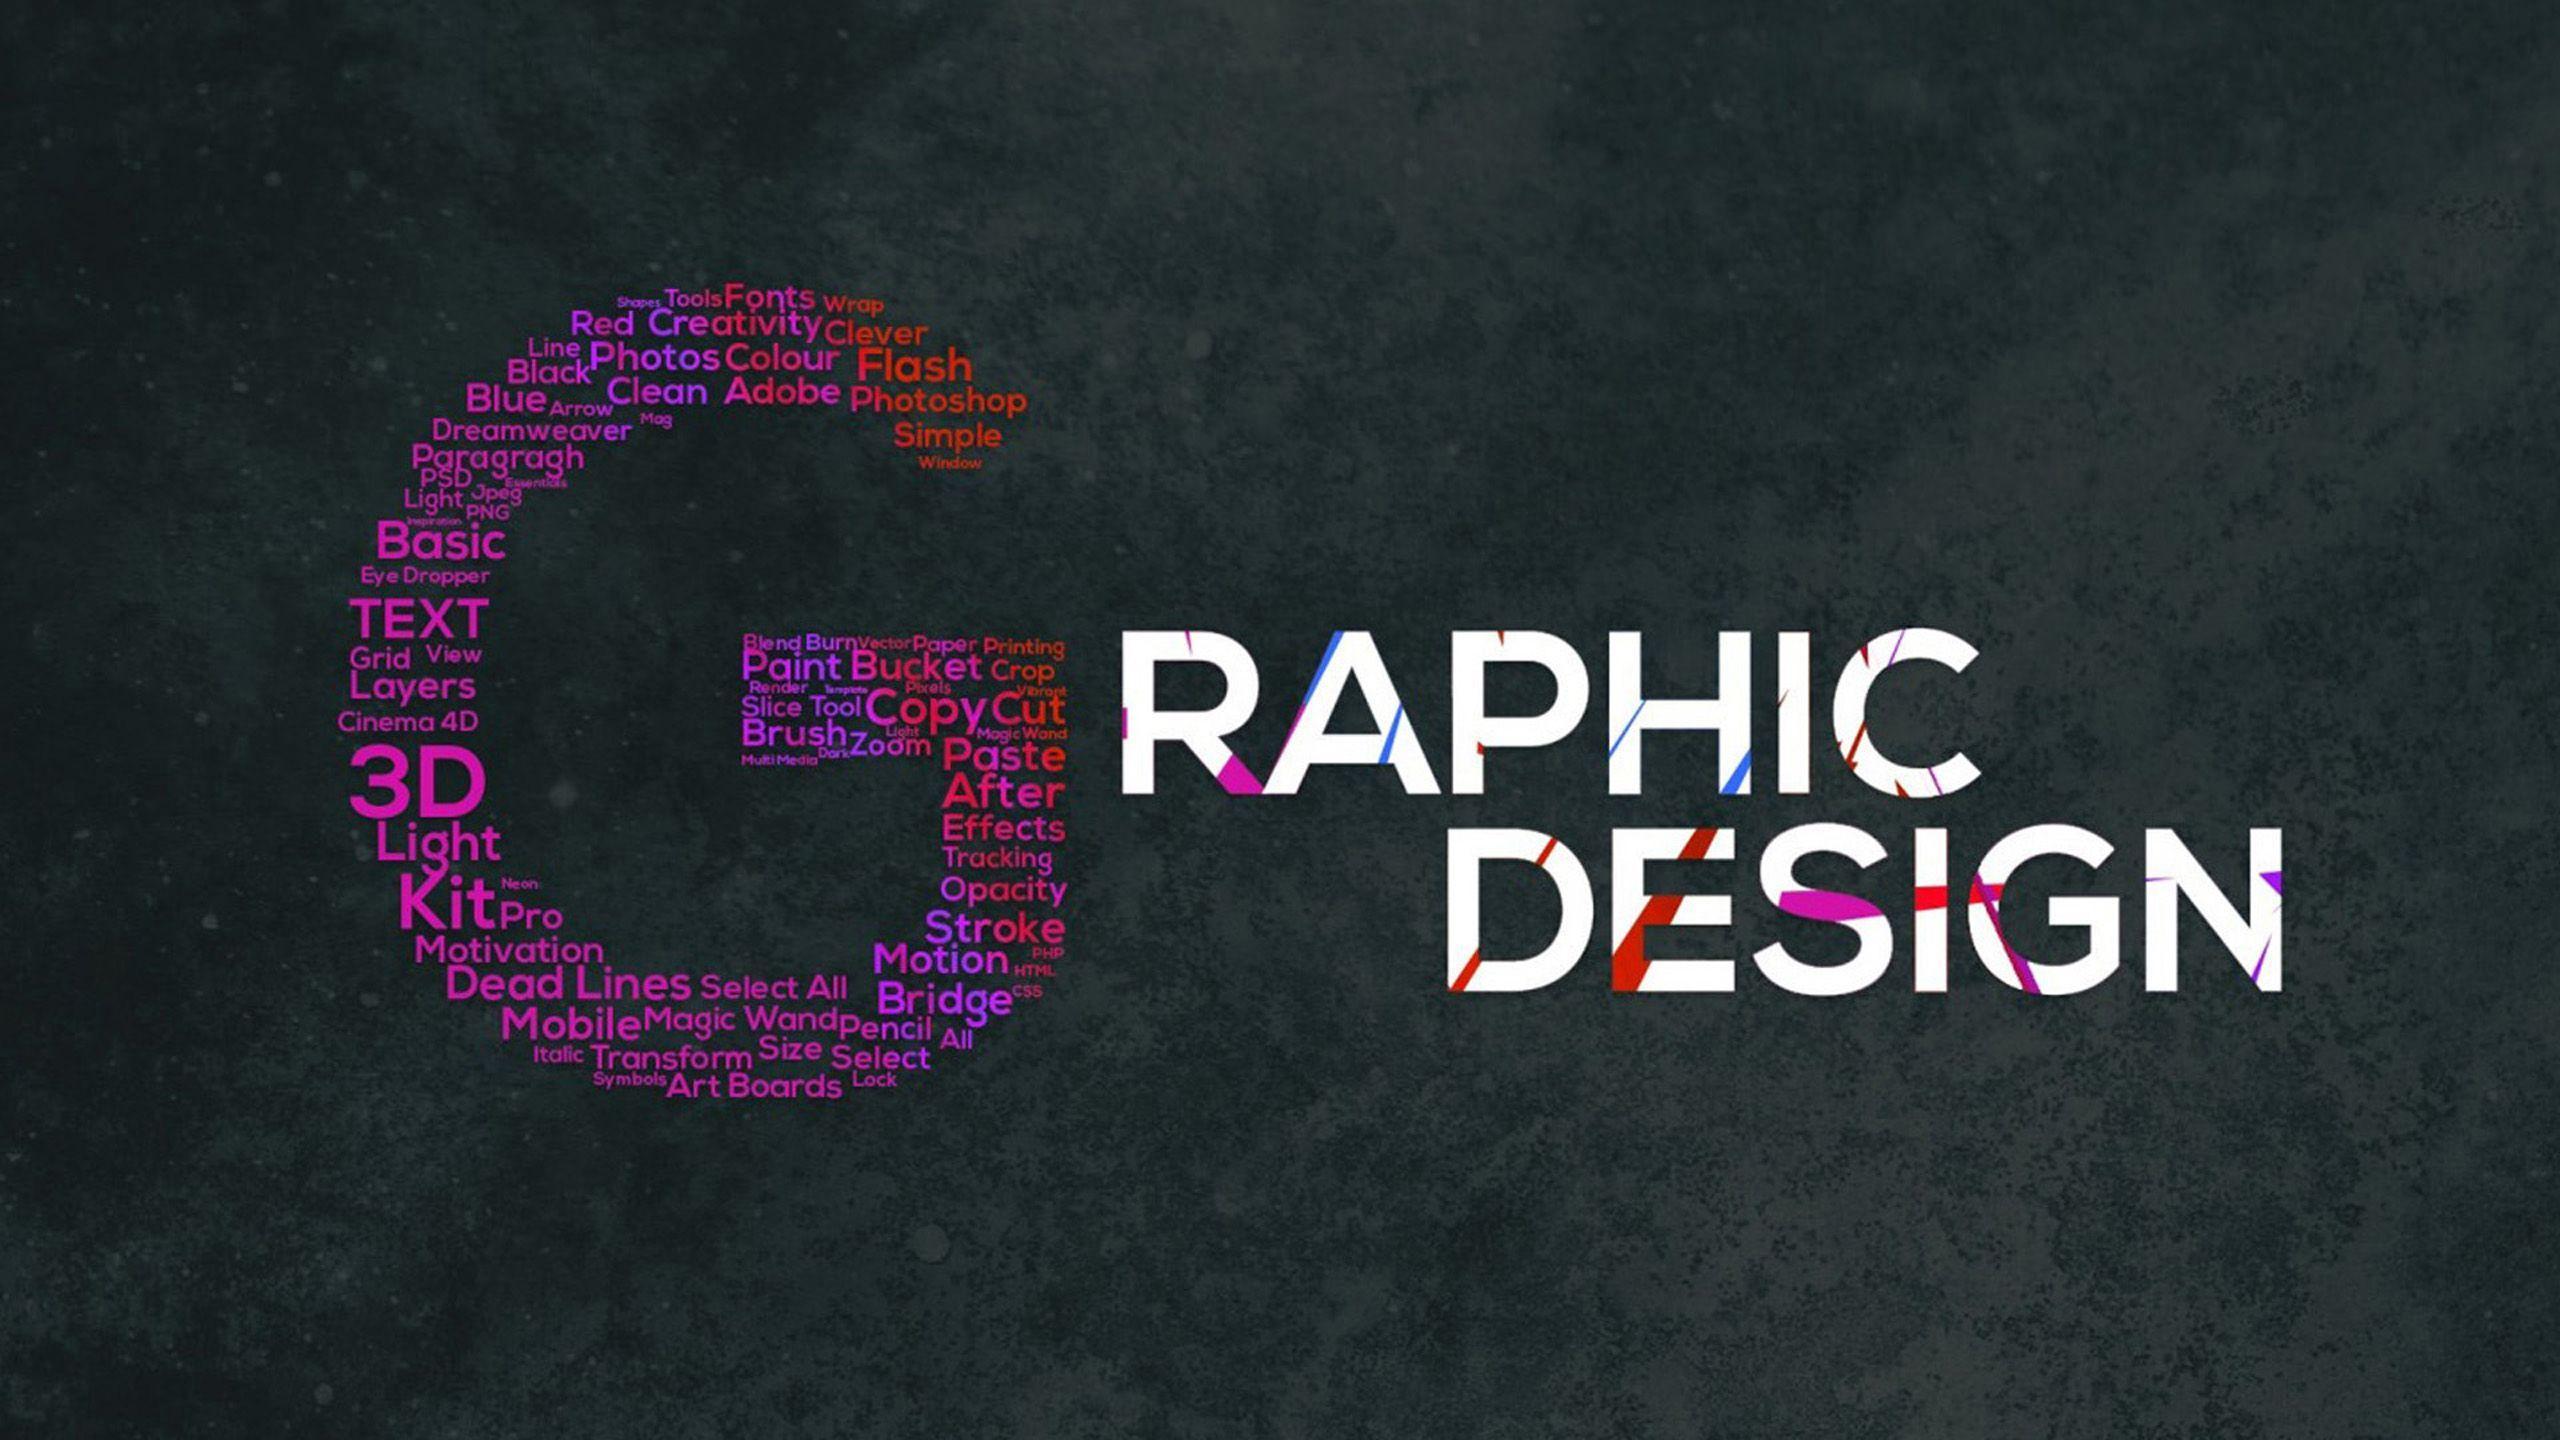 Graphic design wallpapers wallpaper cave - Graphic design desktop wallpaper hd ...